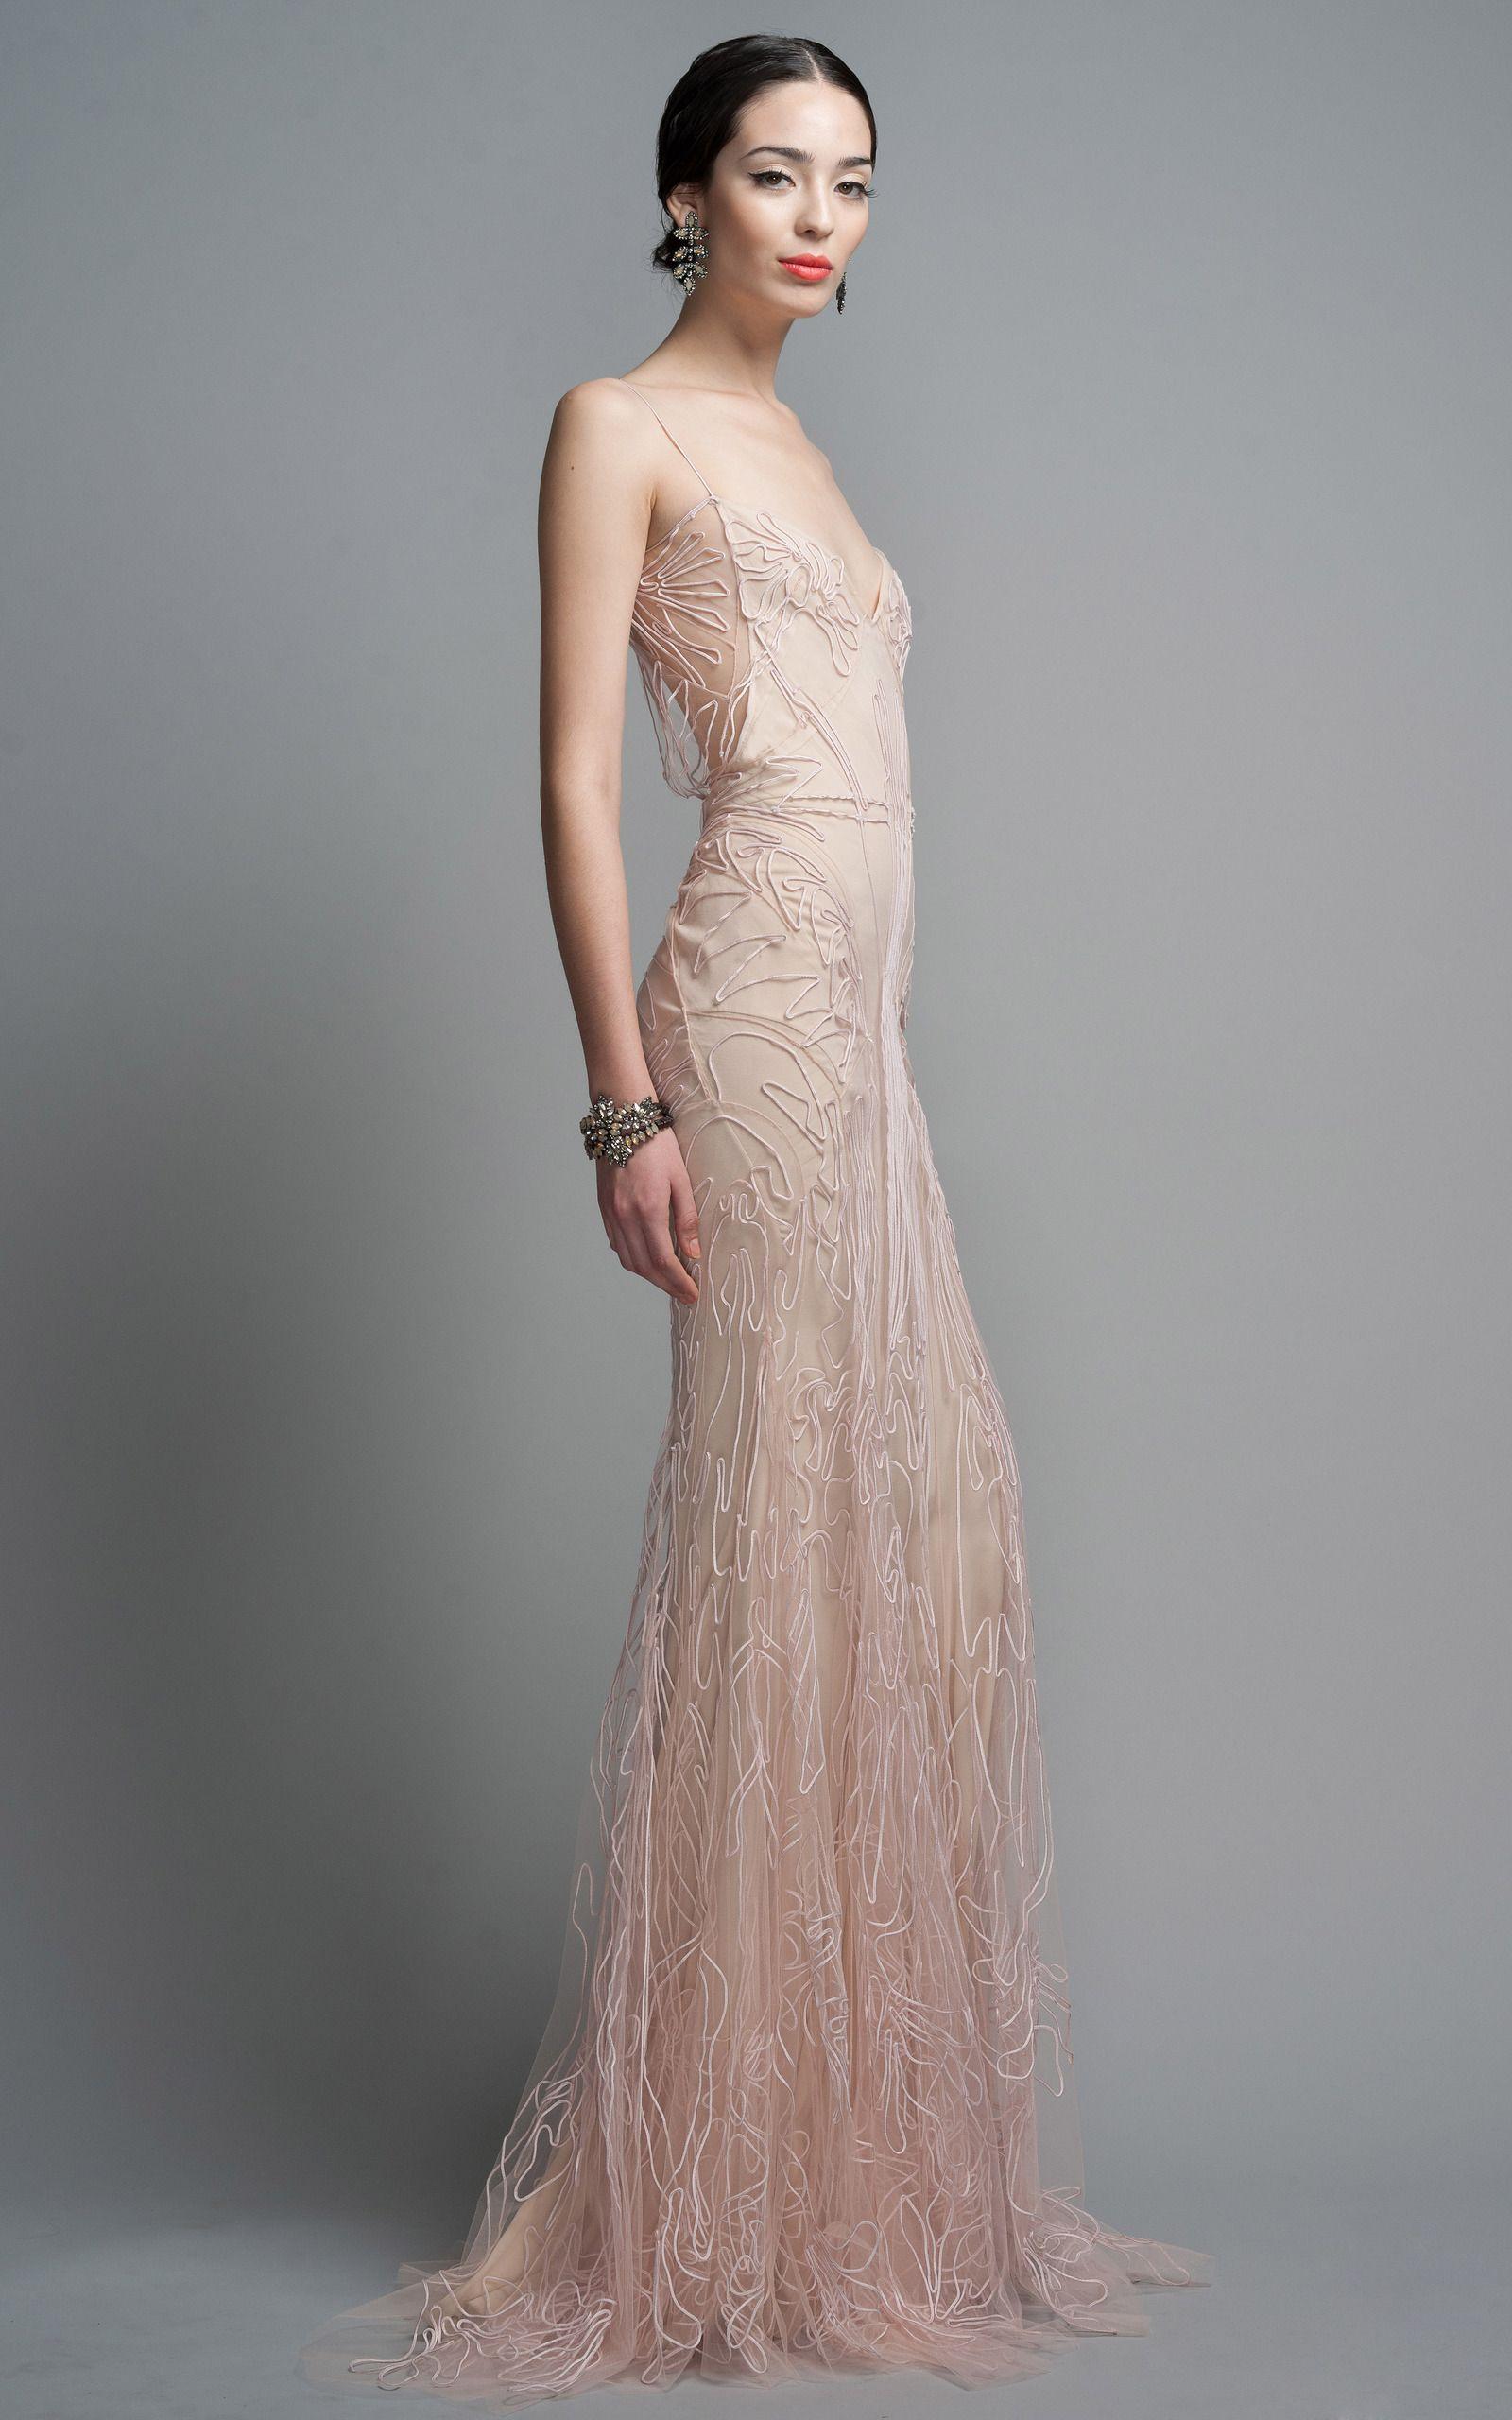 Blush Evening Gown by Zac Posen for Preorder on Moda Operandi   Moda ...